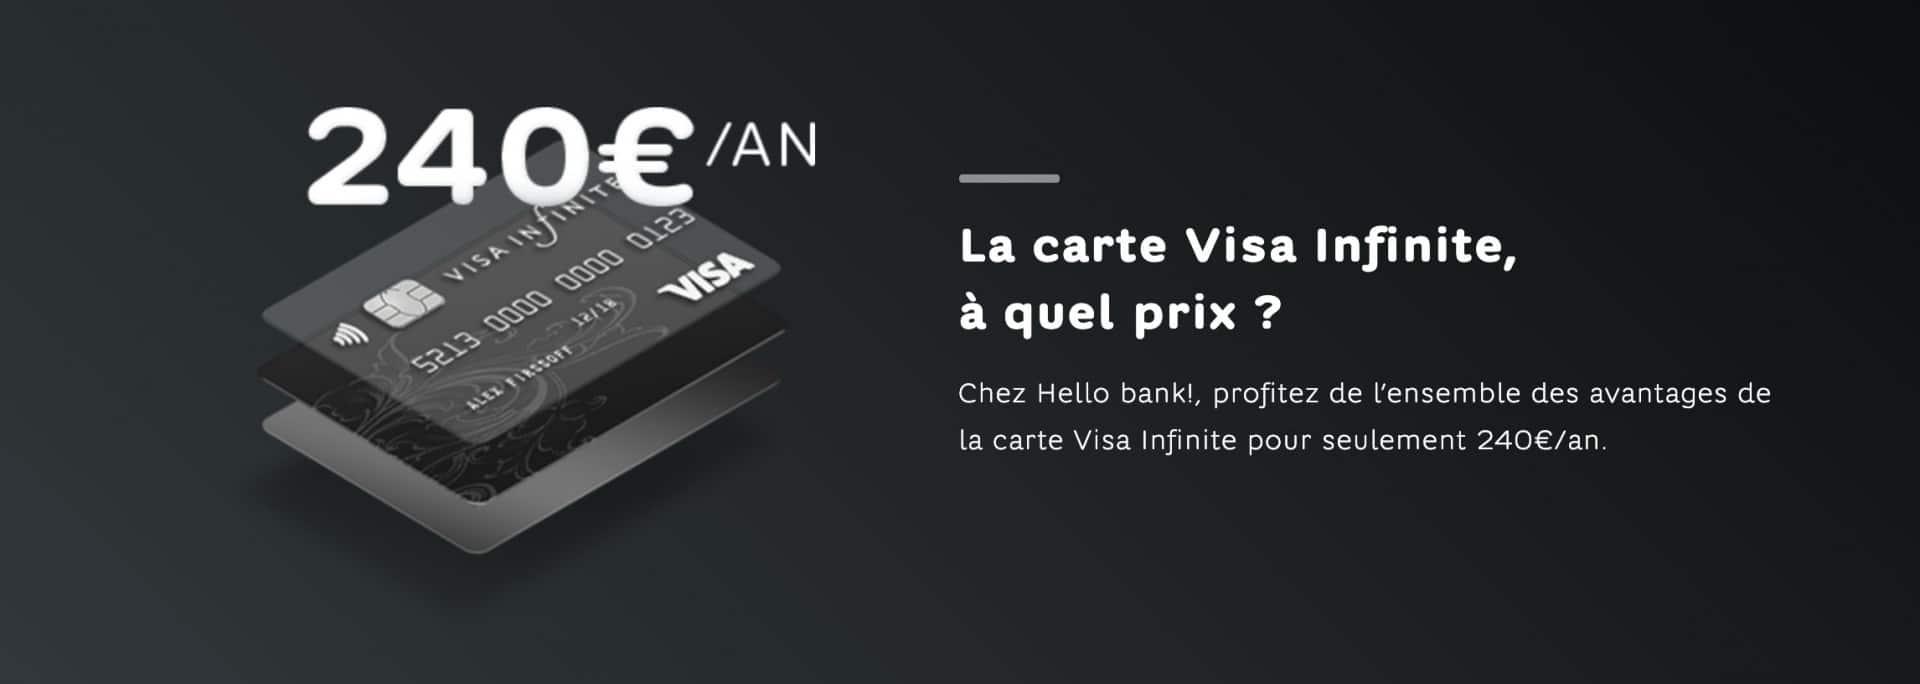 visa infinite hello bank